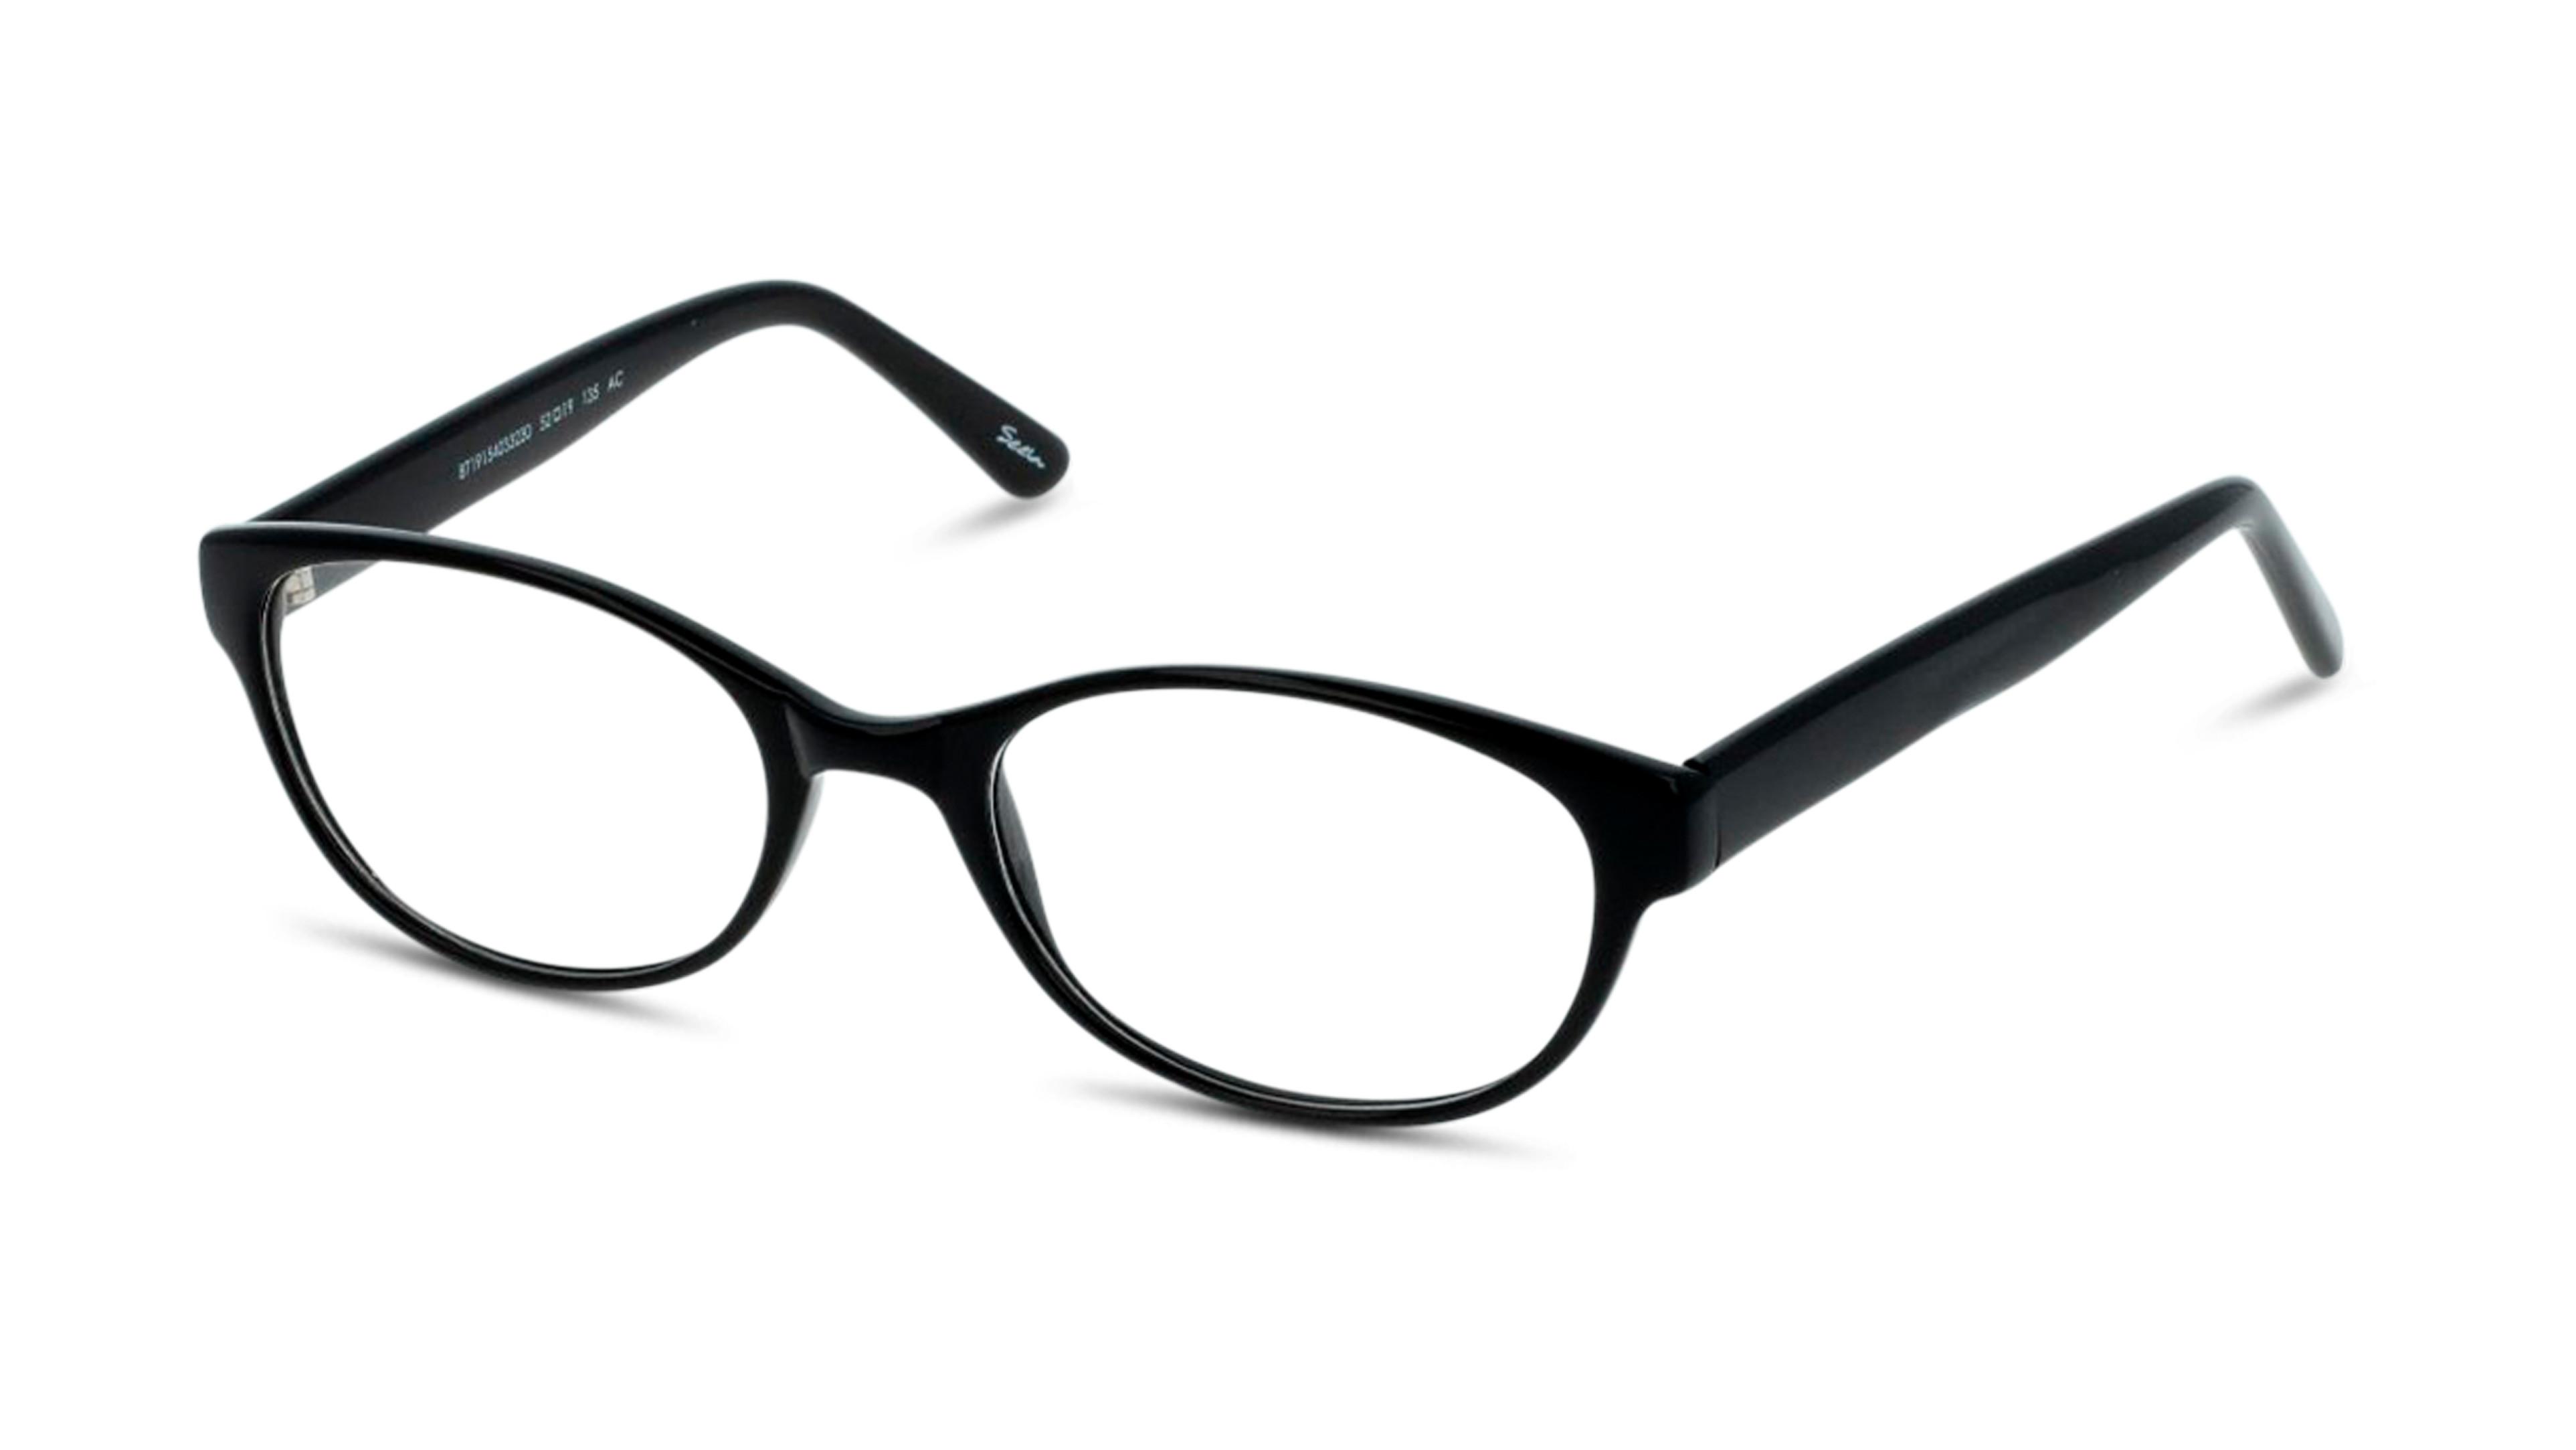 8719154595813-angle-03-Seen-sncf27-eyewear-Black-Black